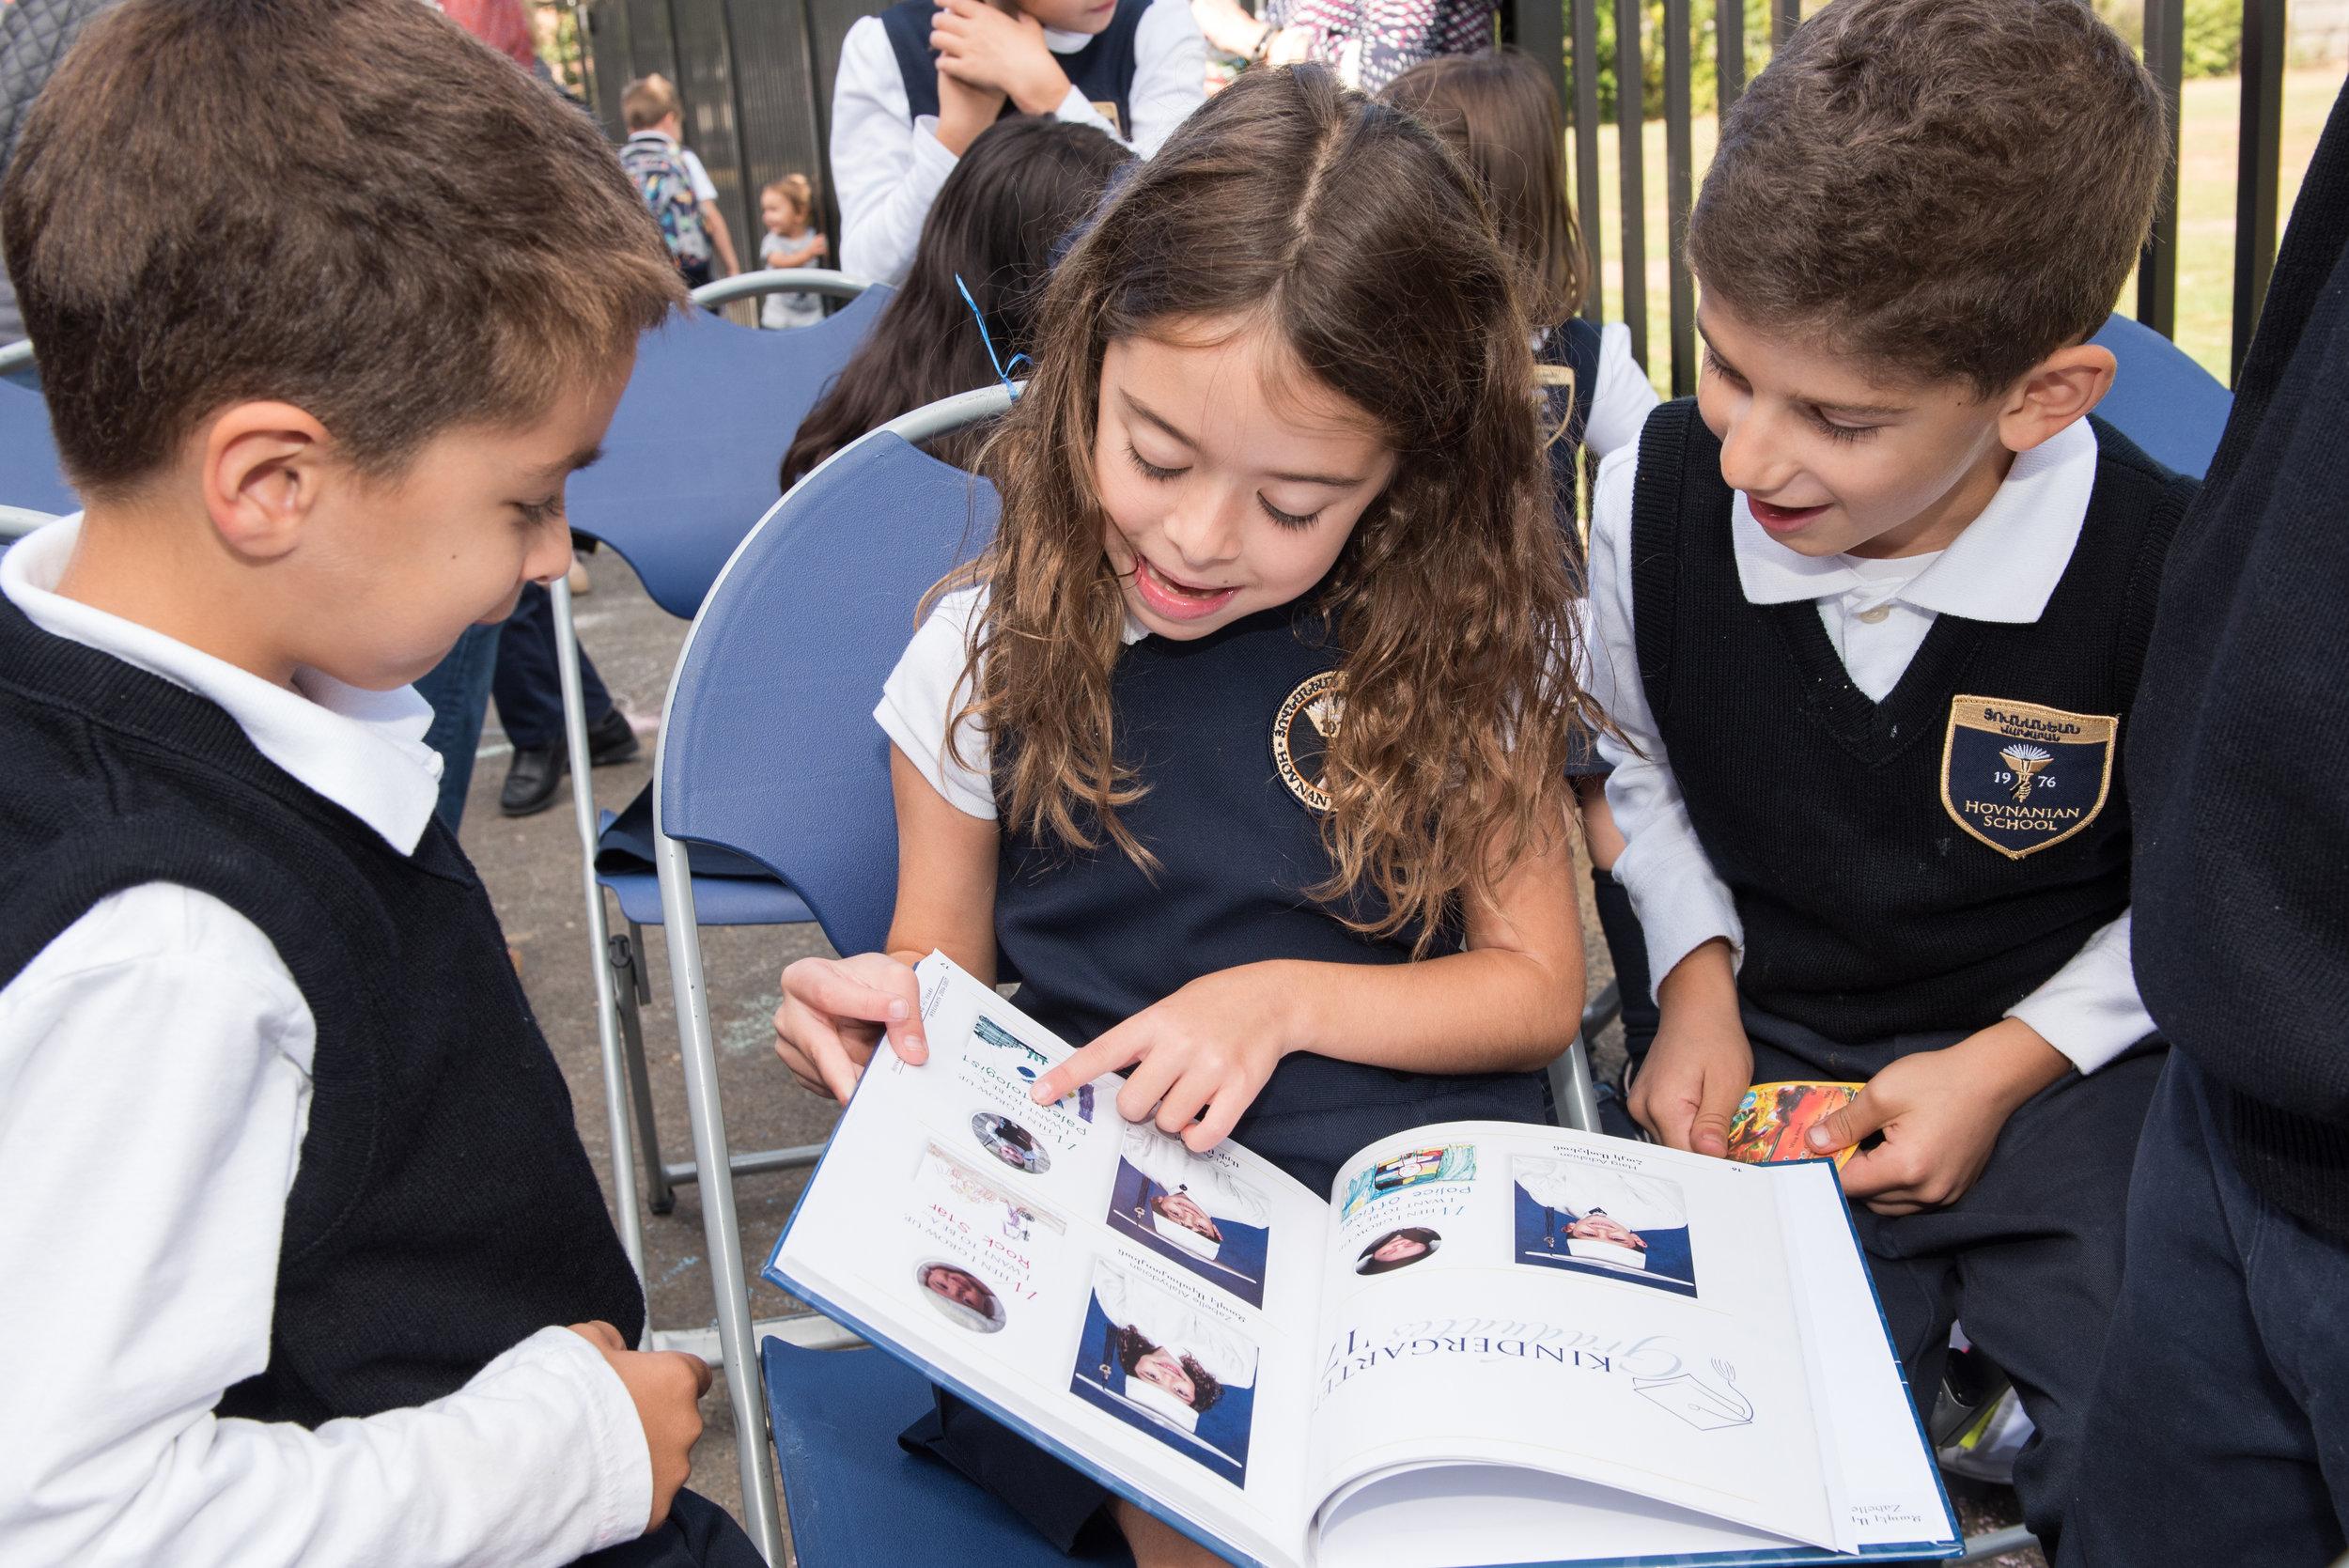 Hovnanian School Playground Opening 09-30-2017 0569.jpg